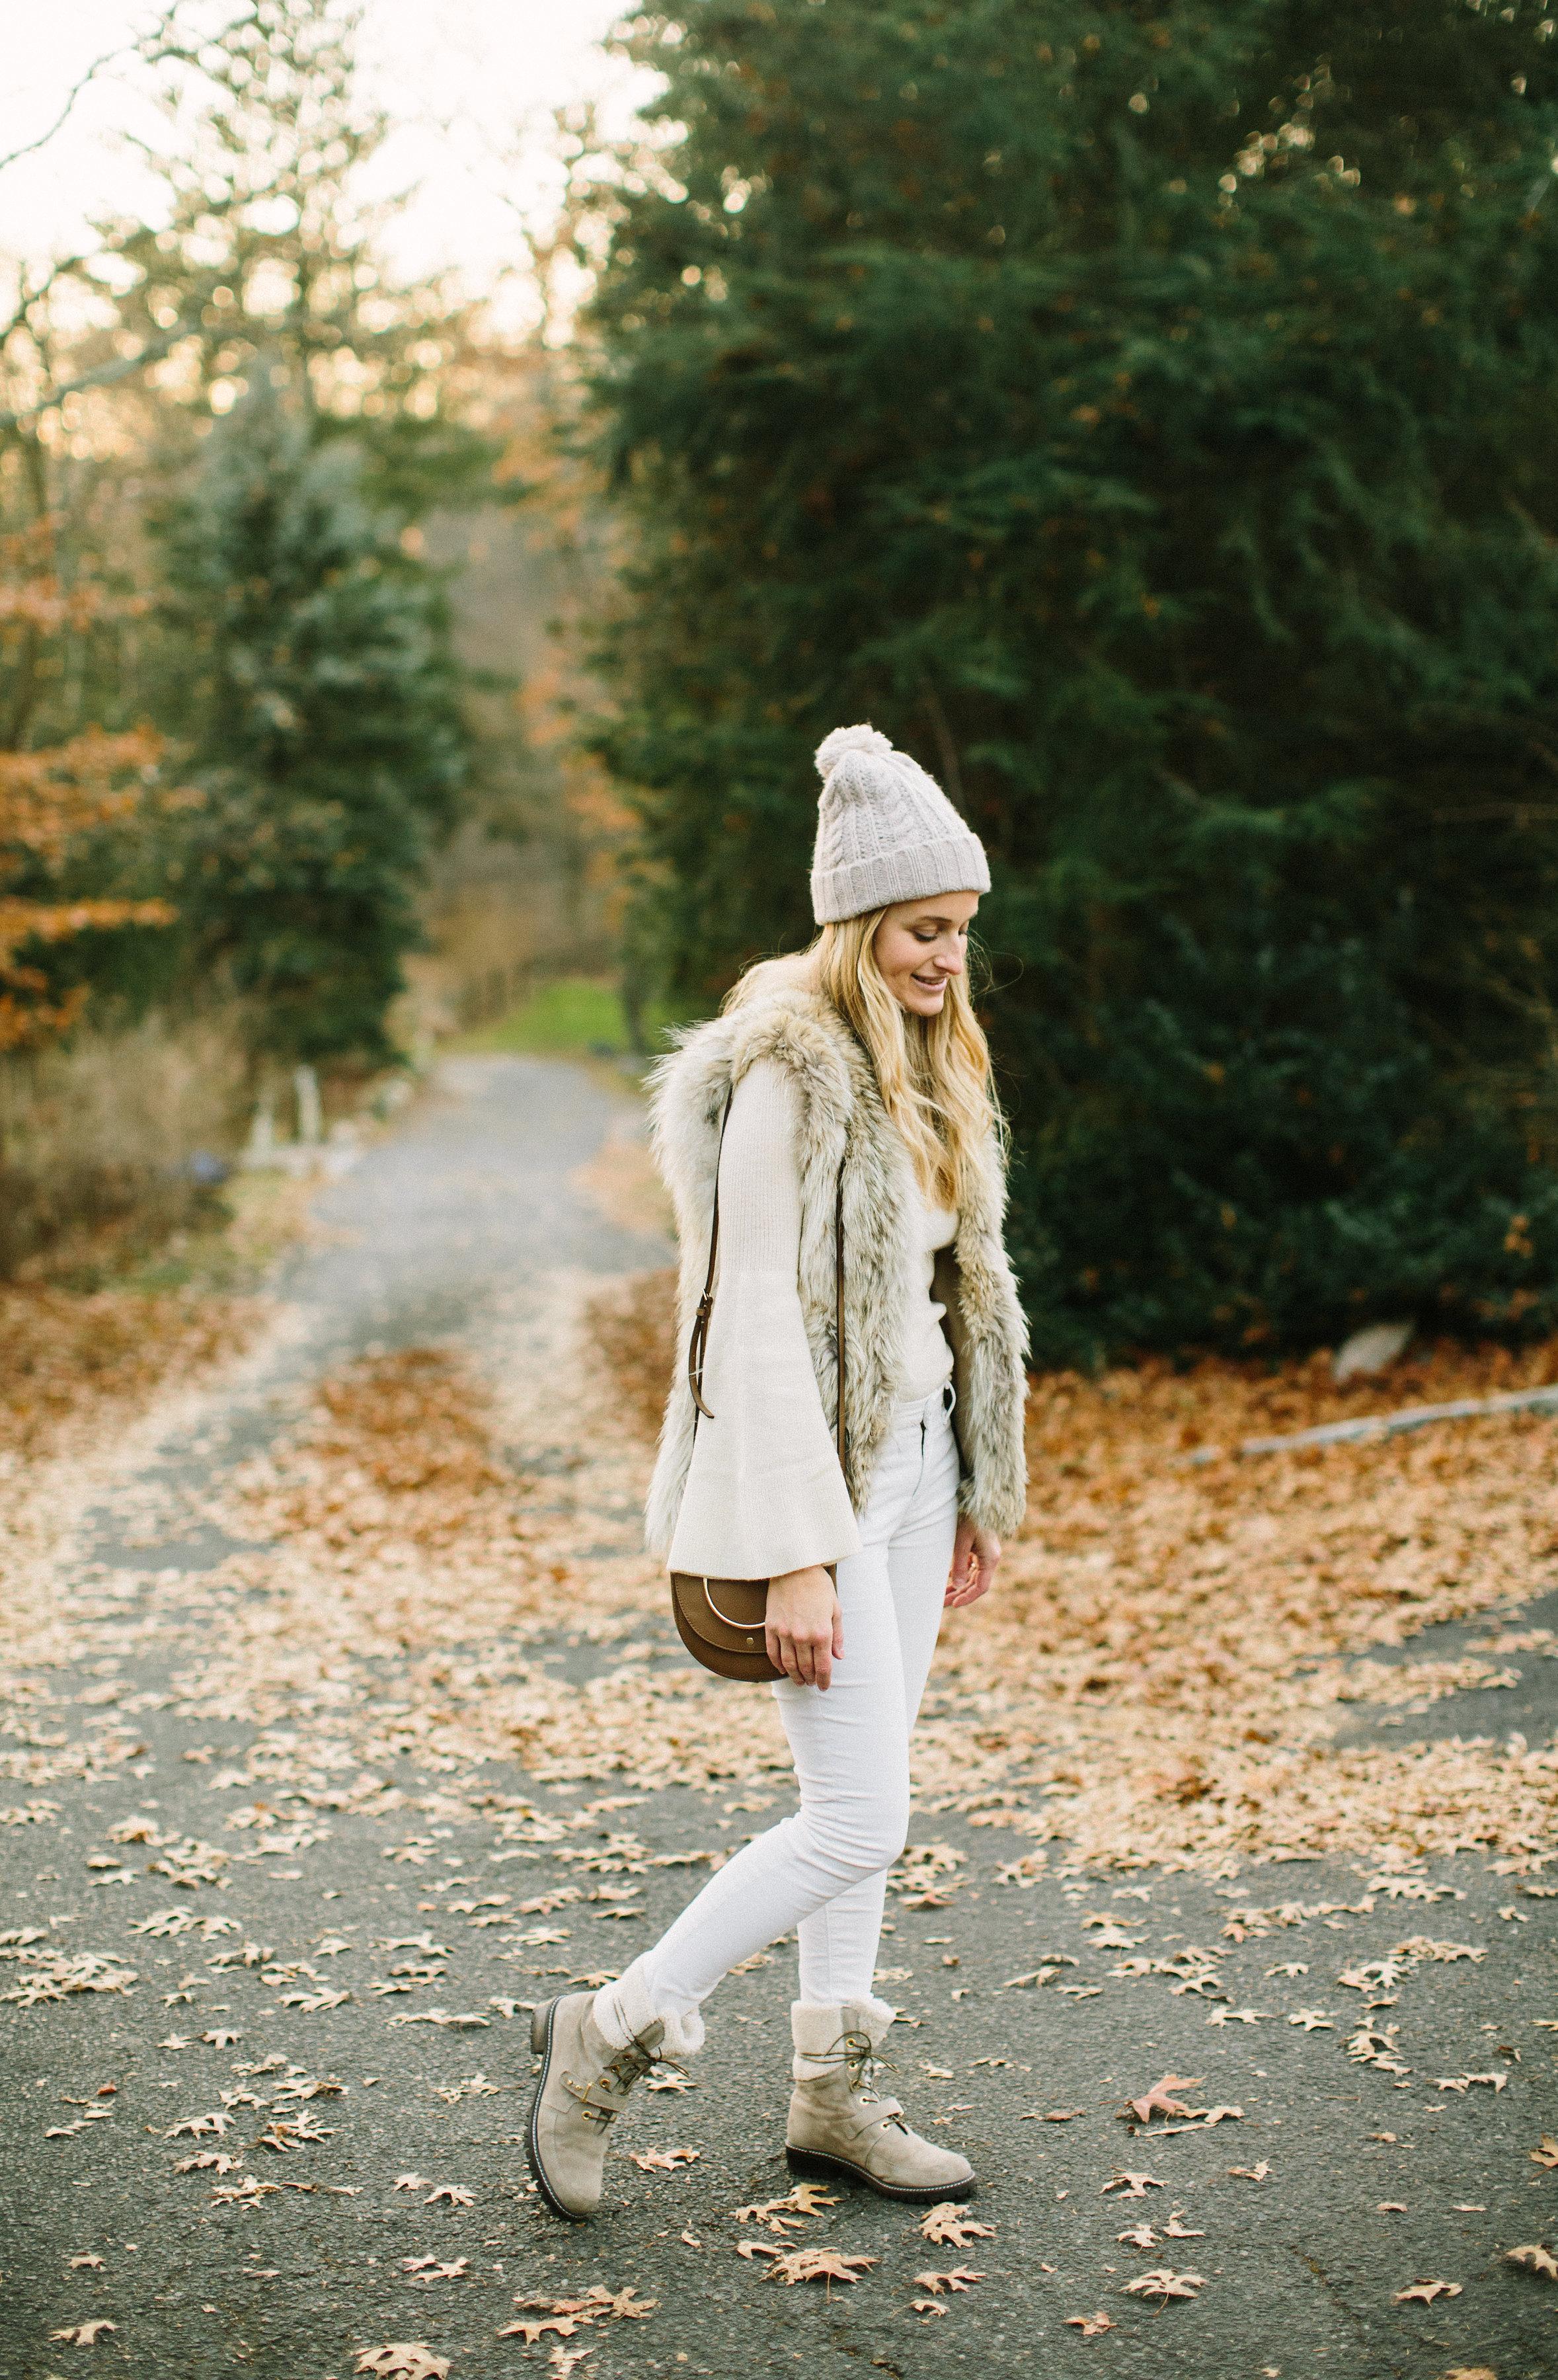 TheGirlGuide-LindsayMaddenPhotography-StephanieTrotta-23.jpg